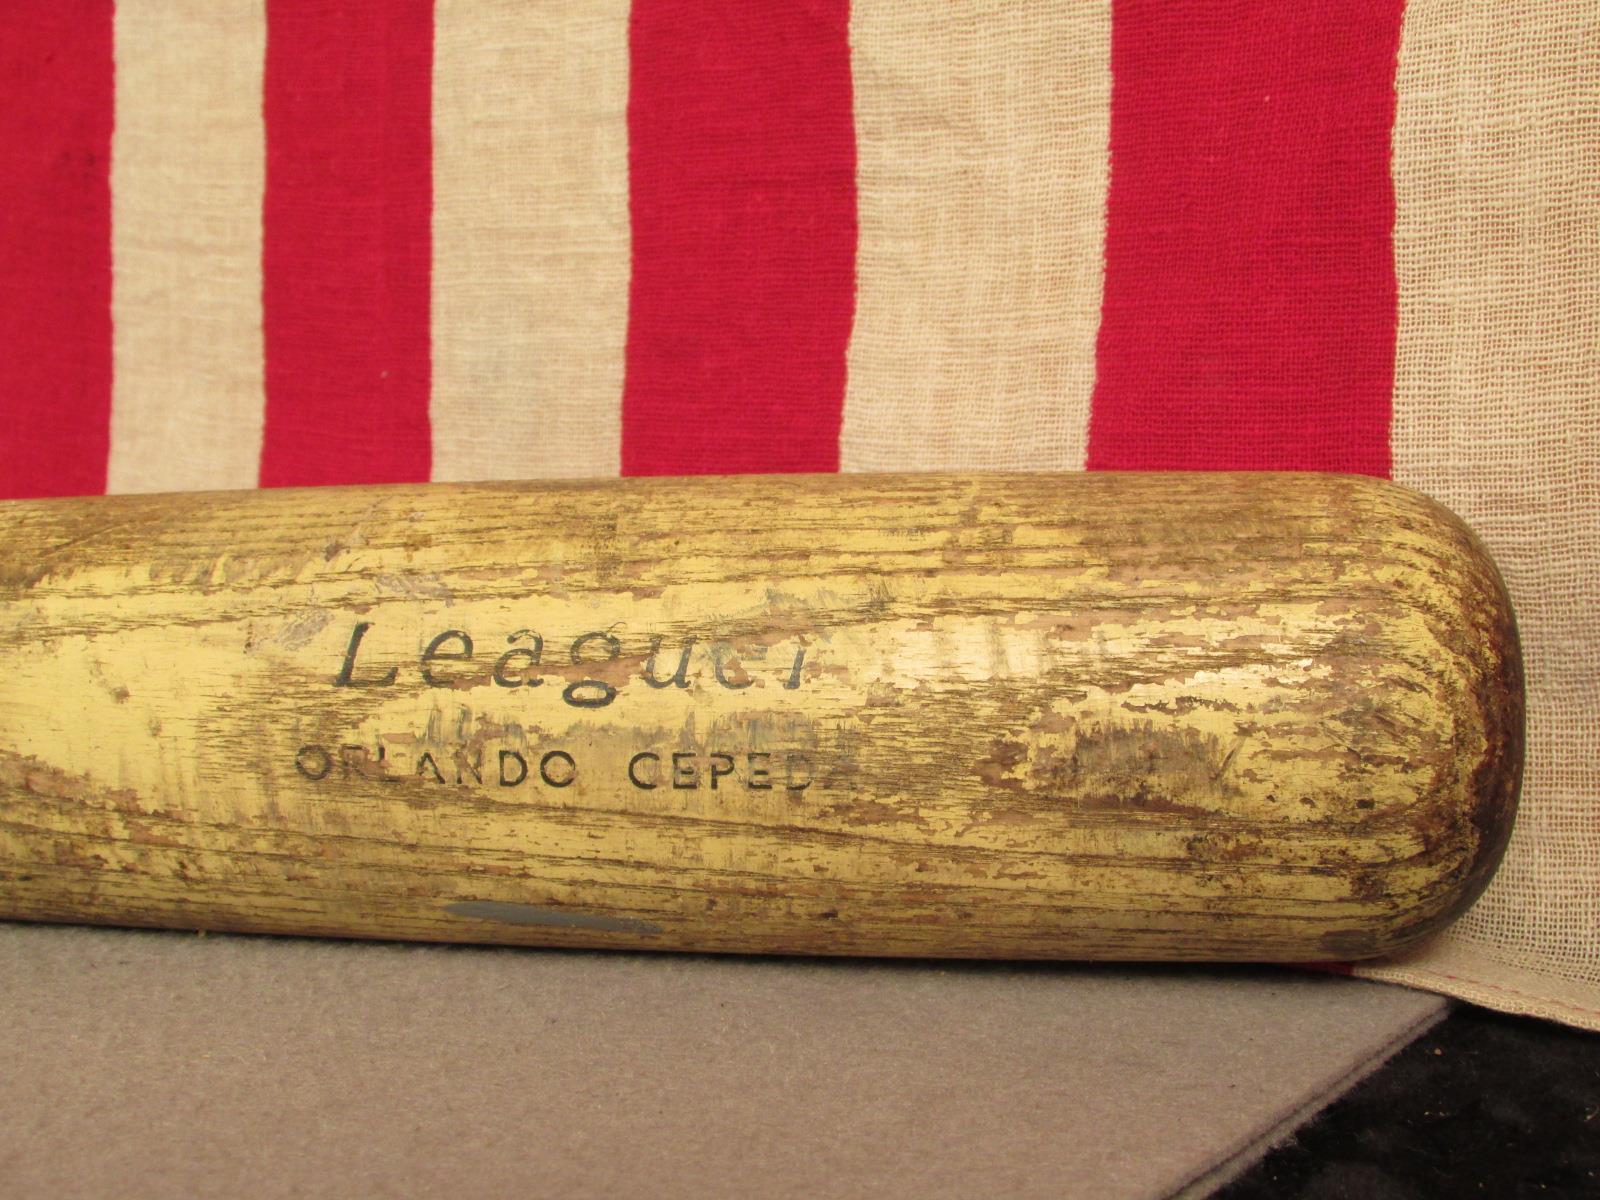 Vintage Sears Holz Baseball Schläger 1718 1718 1718 Leaguer Orlando Cepeda Modell 34   8dd812